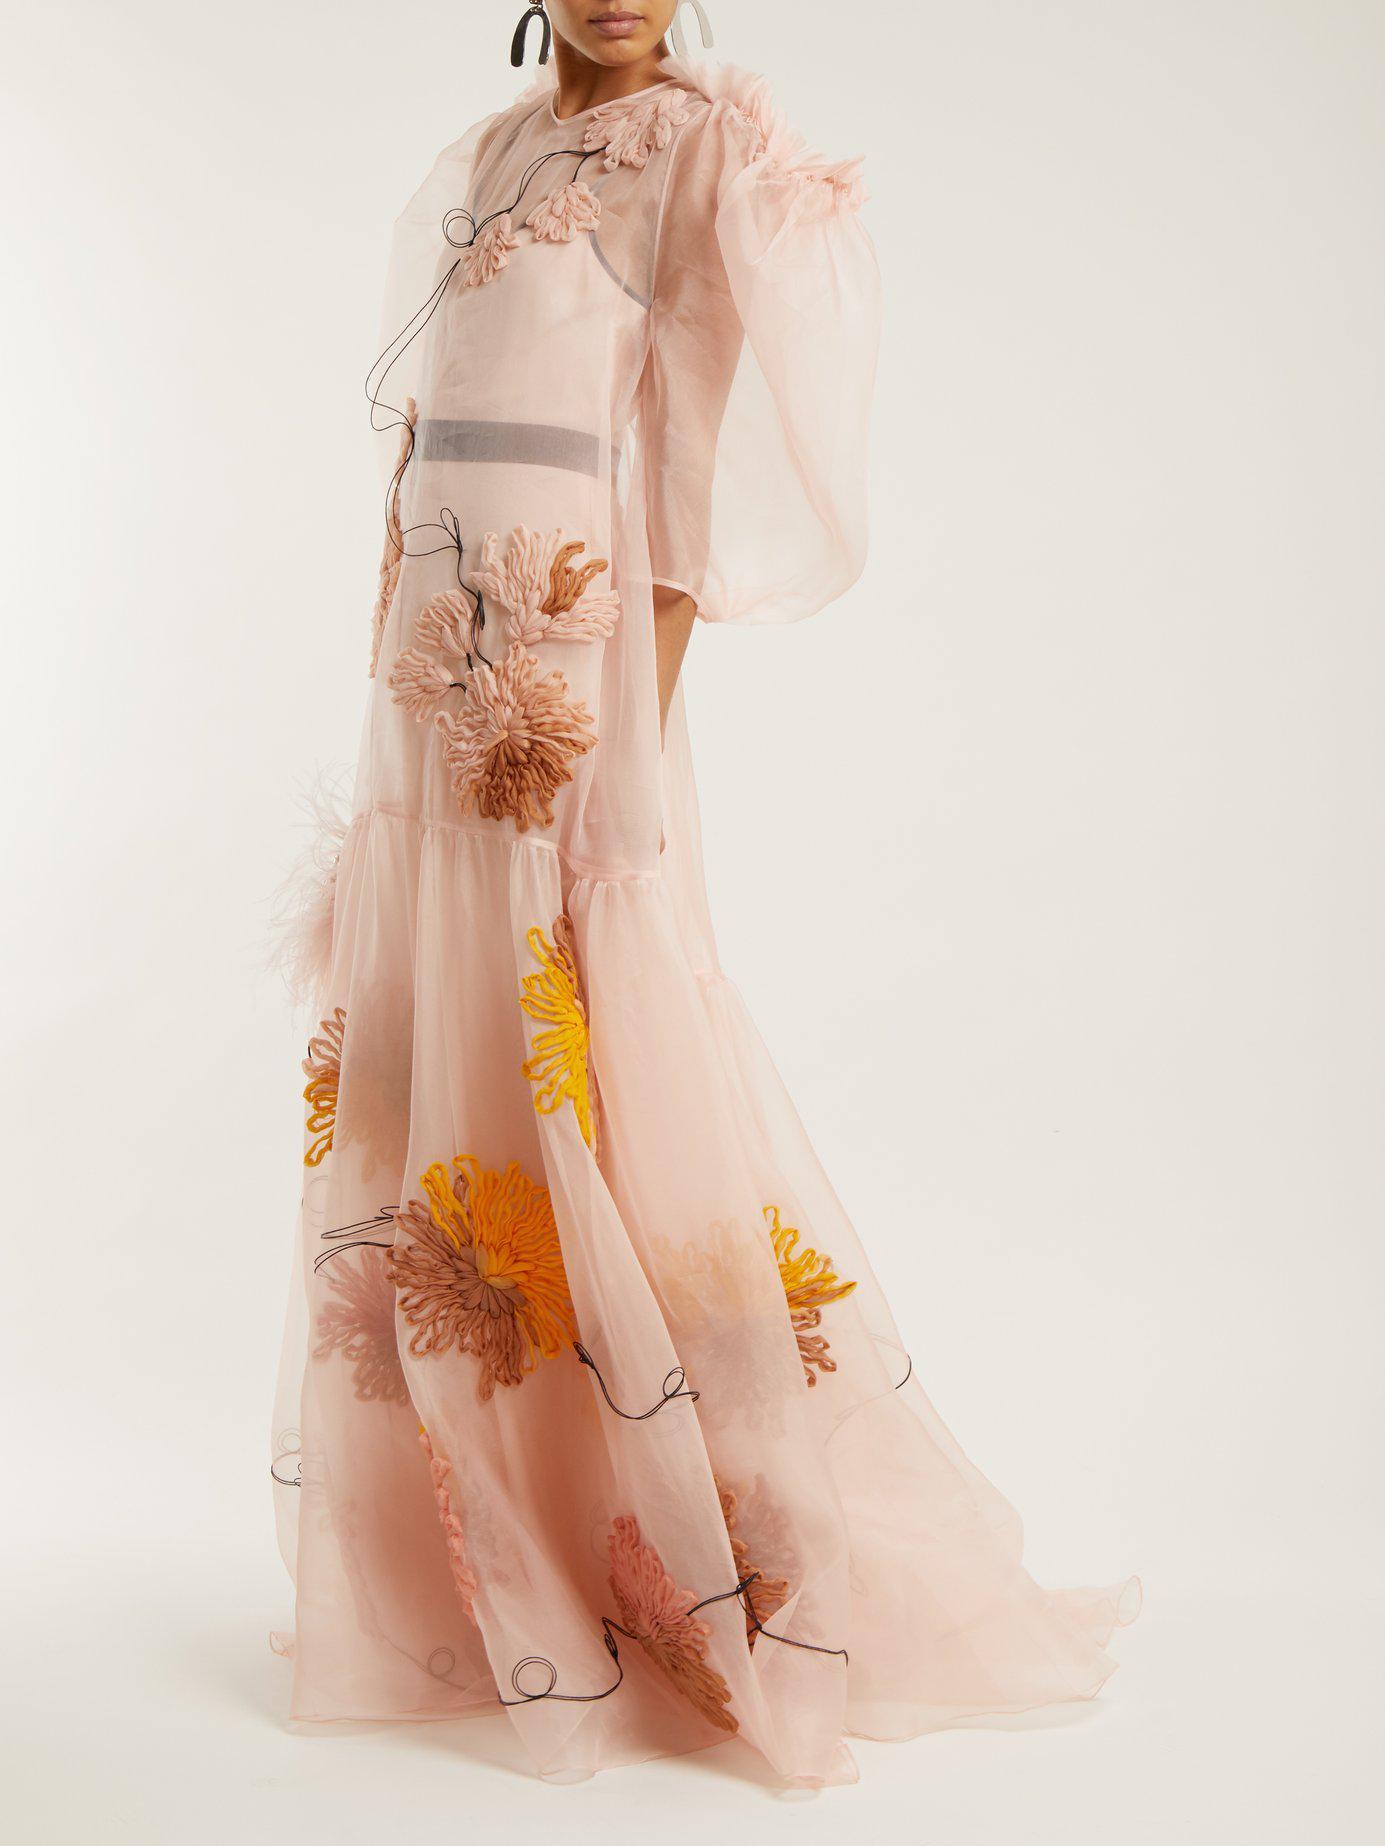 Outlet Order Online Sale Marketable Aurorah floral-embroidered silk dress Roksanda Ilincic Fast Delivery Ebay Cheap Price Sale Inexpensive nj33xG8ti